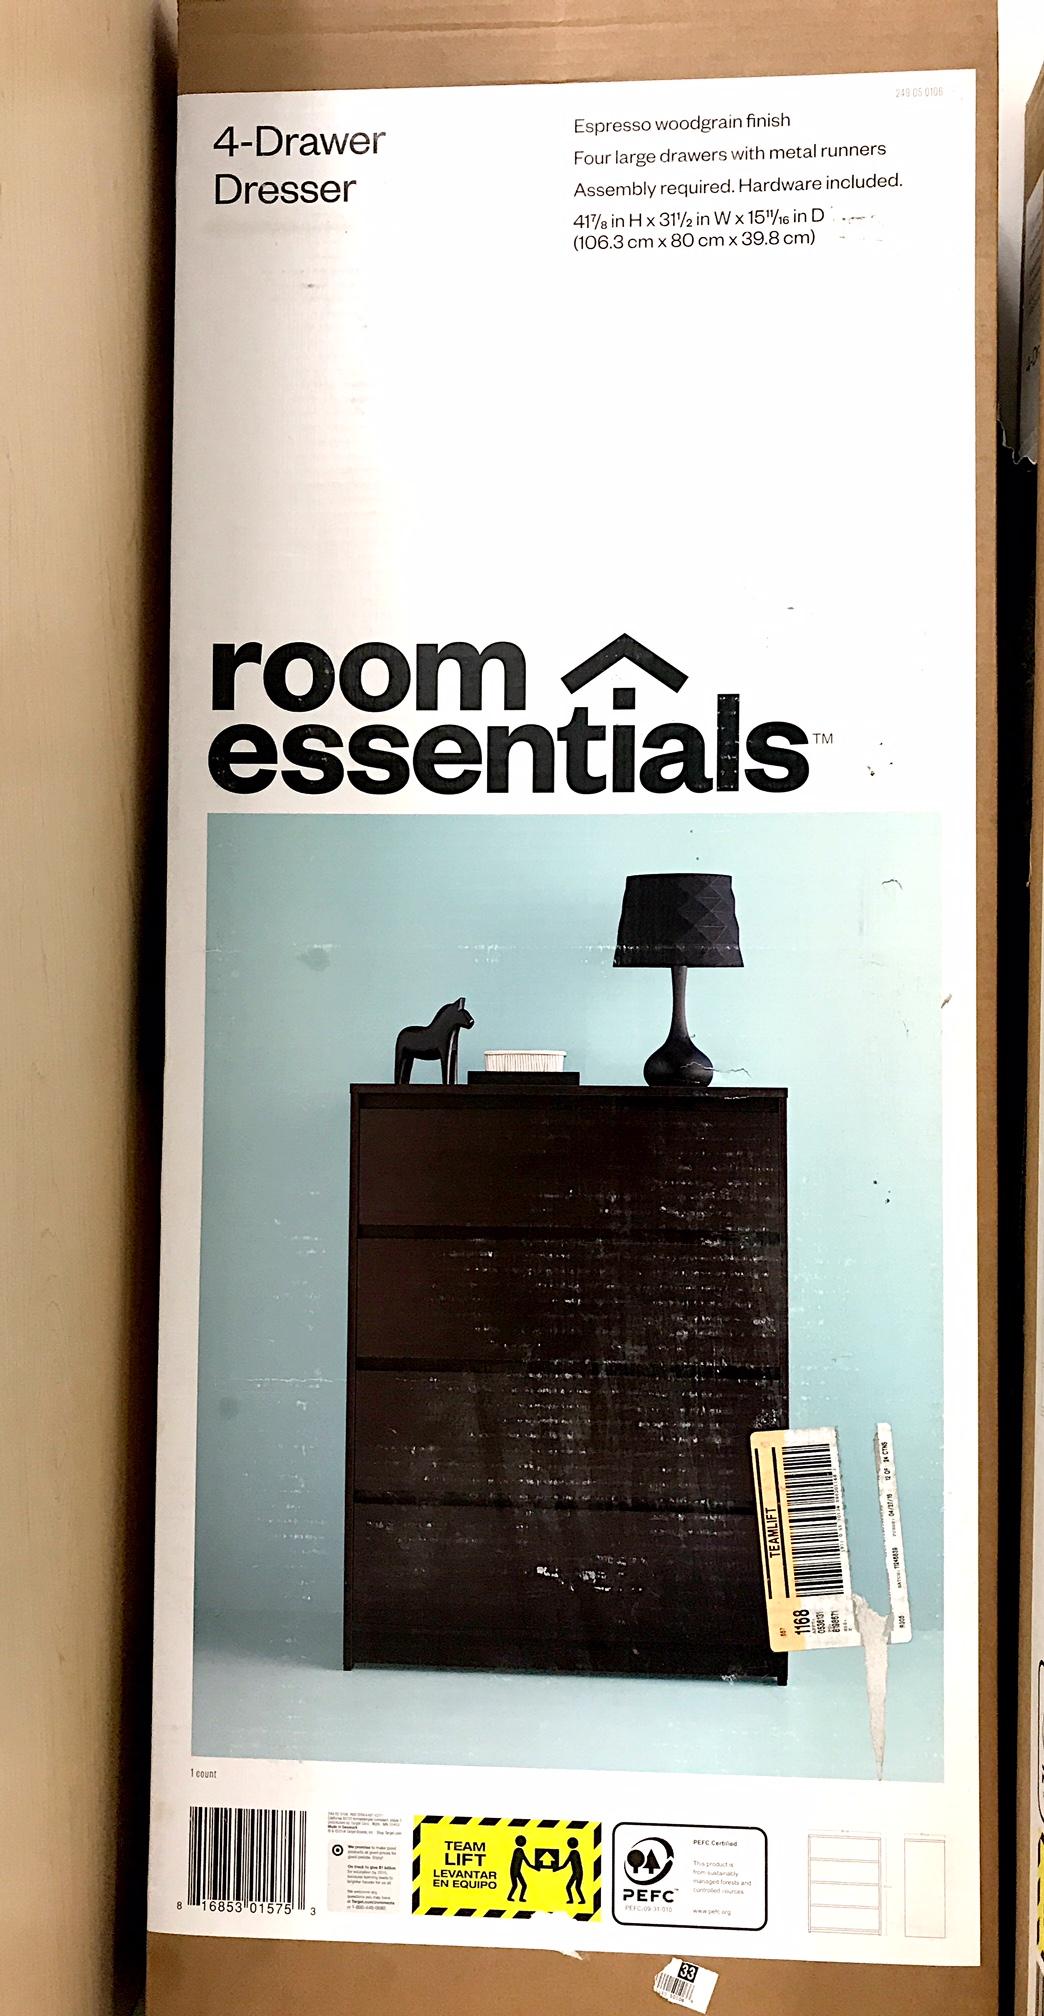 Target Recalls Room Essentials 4 Drawer Dressers Due To